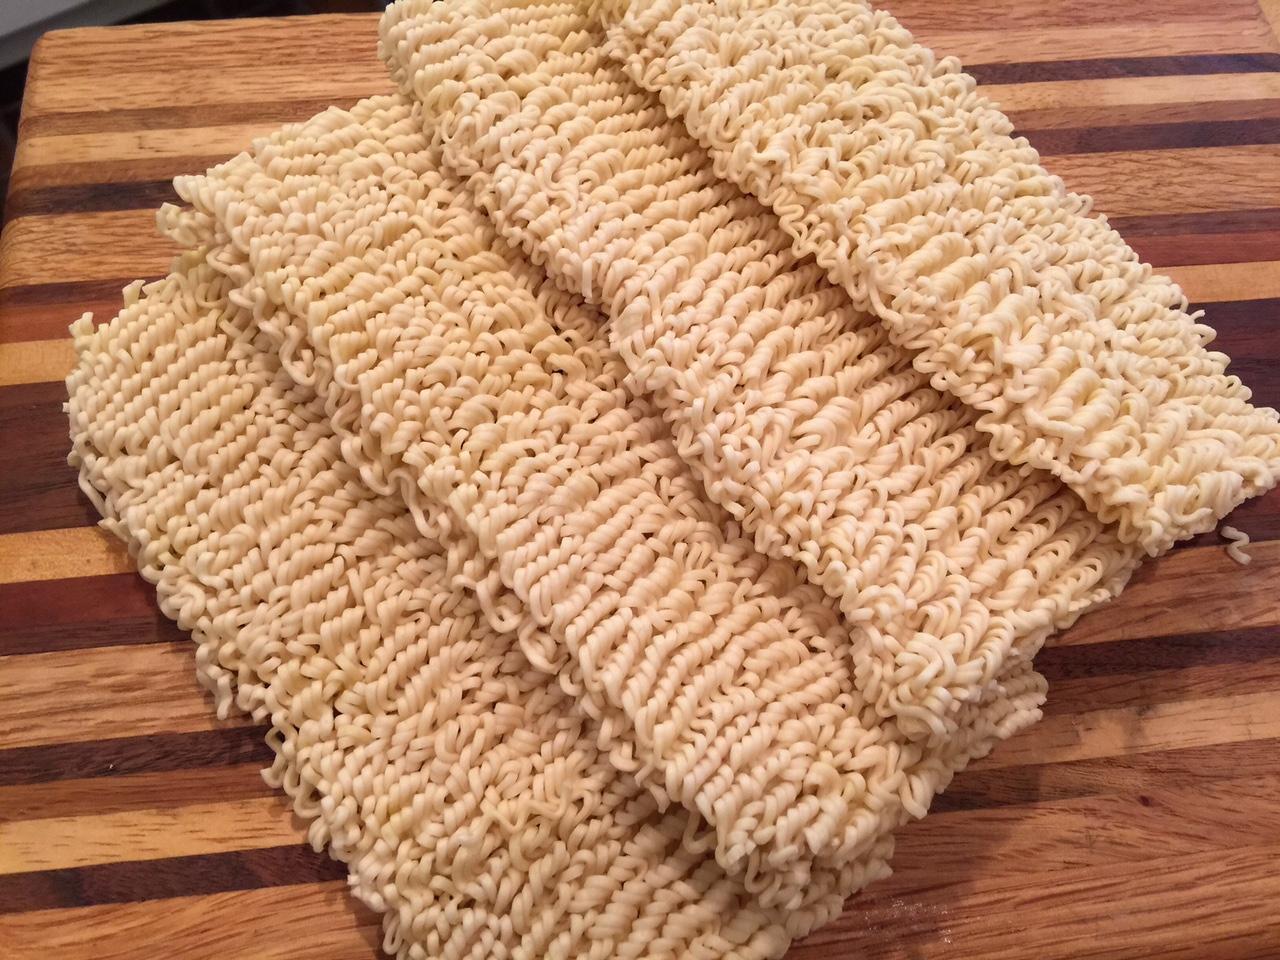 Ramen noodles for Ramen soupIMG_2188